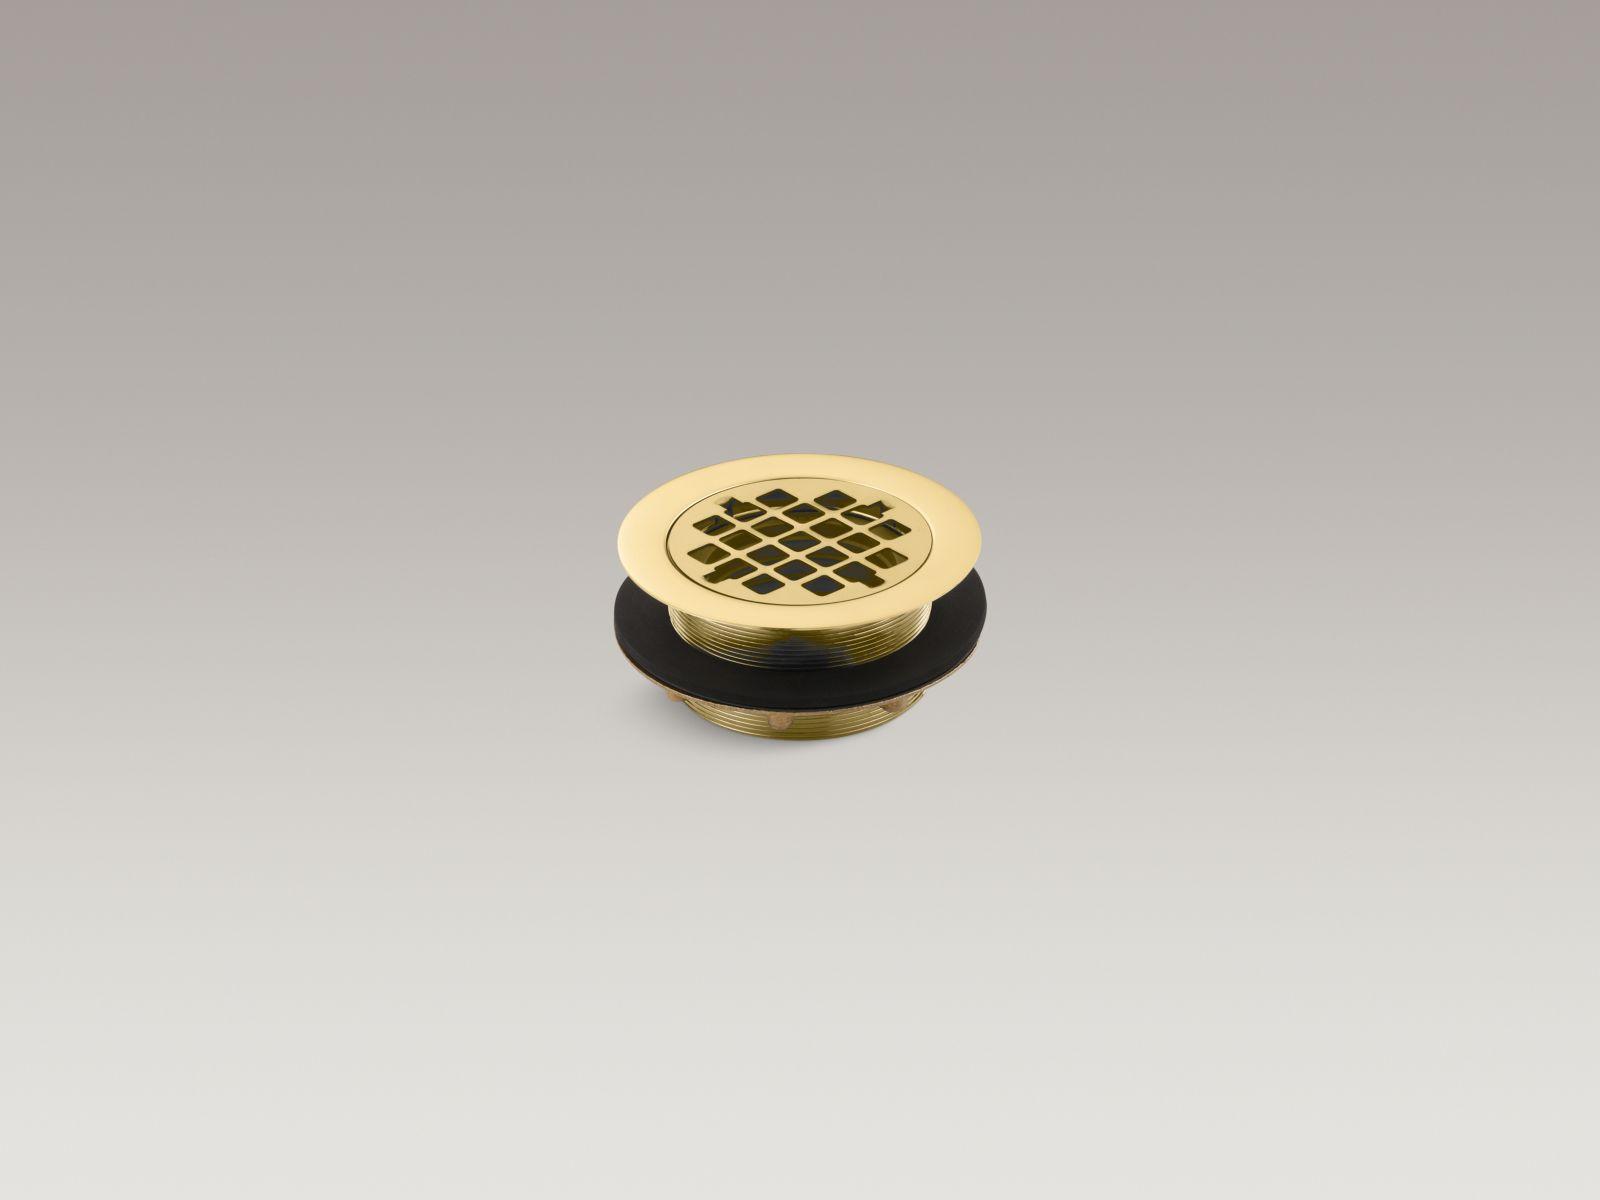 Kohler K-9132-PB Round Shower Base Drain with Plastic Pipe Gasket Vibrant Polished Brass